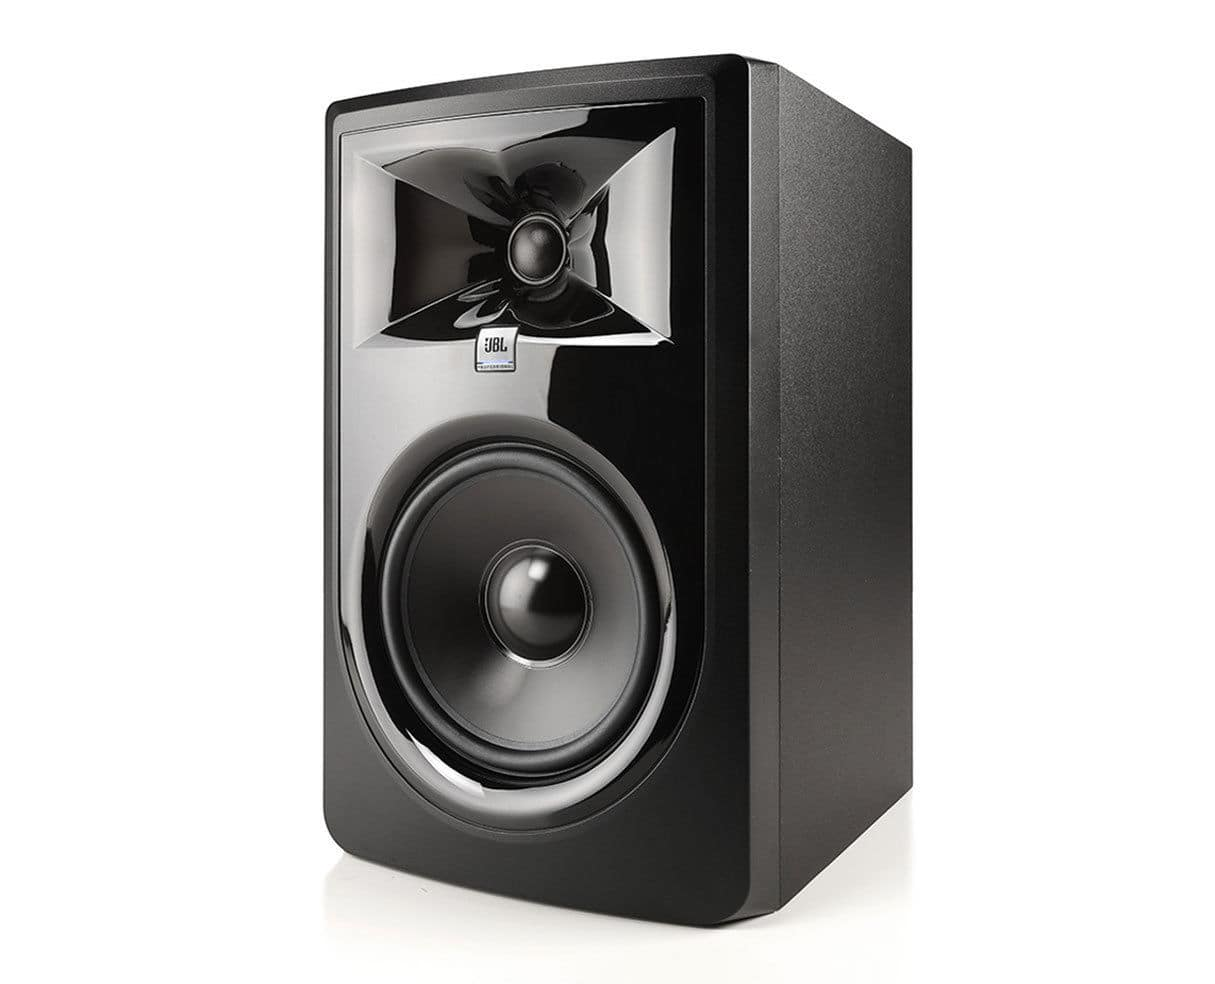 jbl ti 1k center speakers owners manual 2019 ebook library. Black Bedroom Furniture Sets. Home Design Ideas